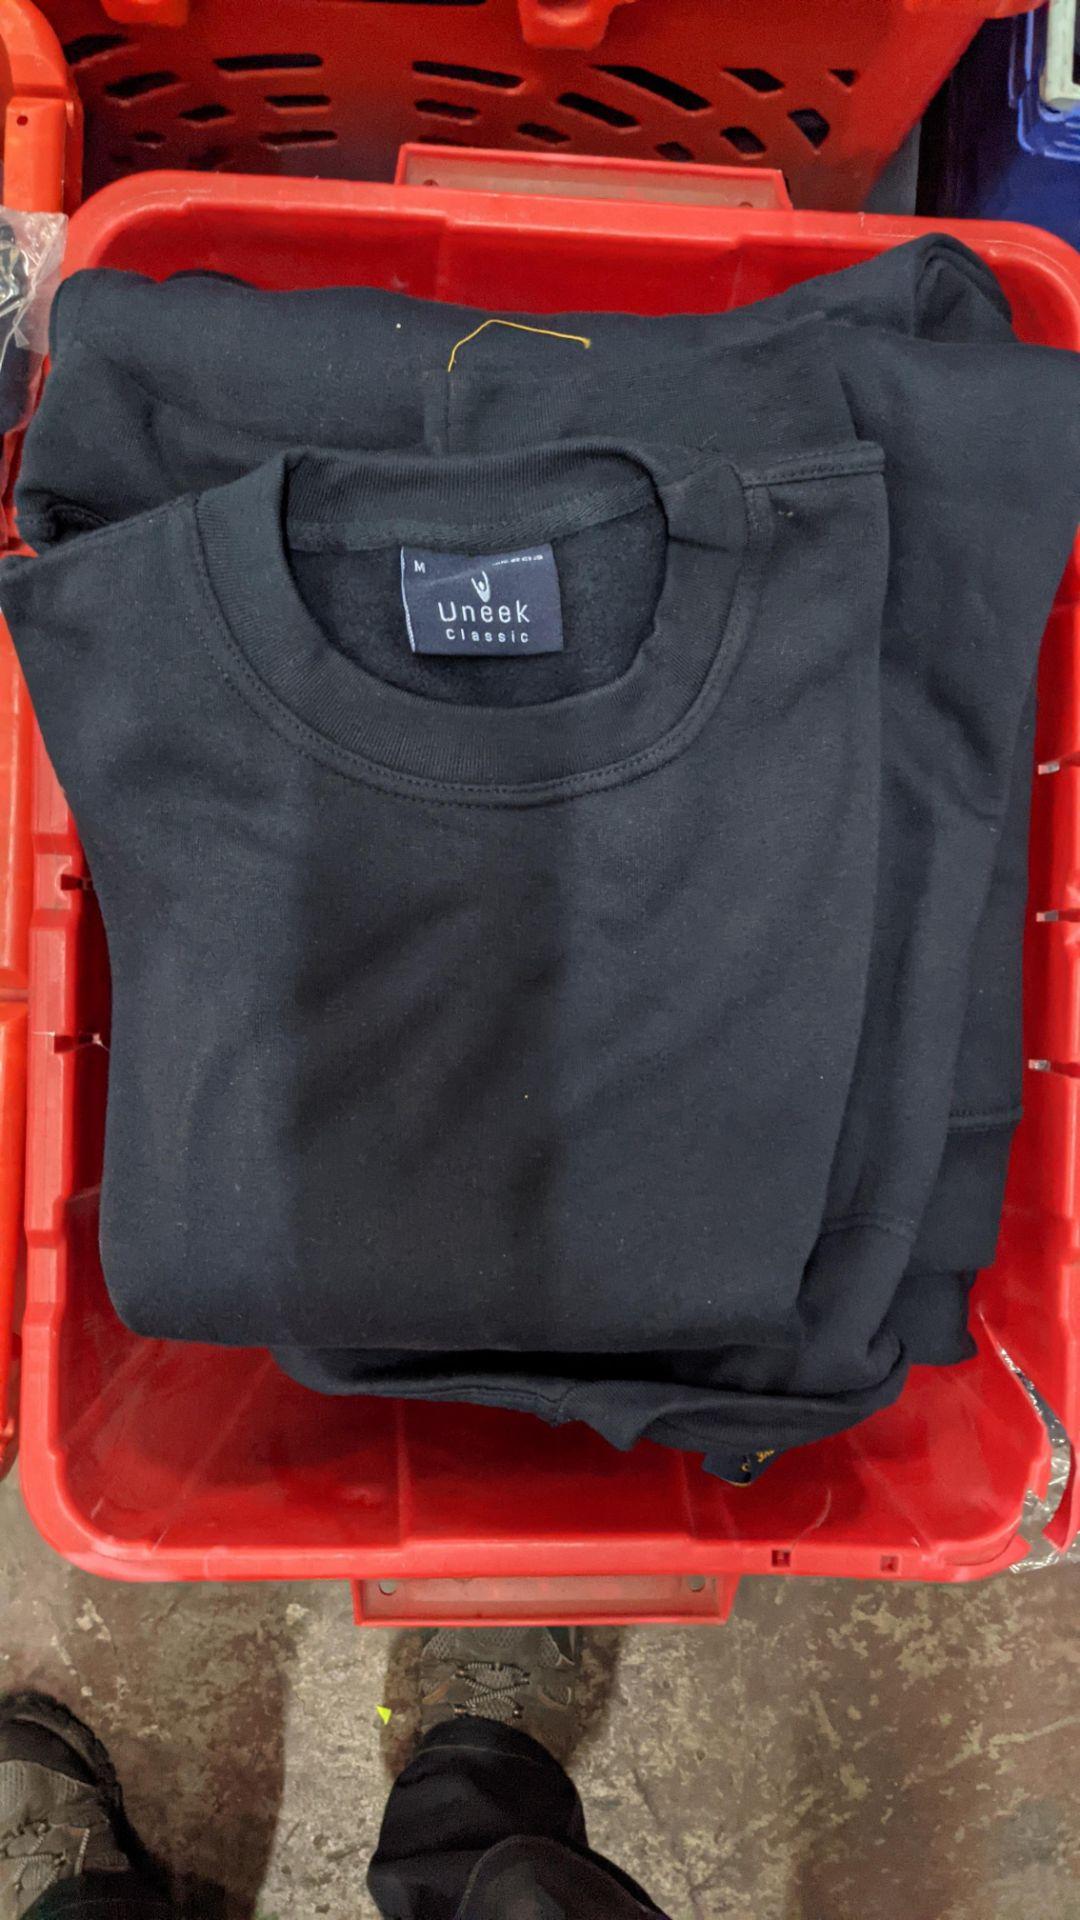 Approx 12 off navy sweatshirts - Image 5 of 5